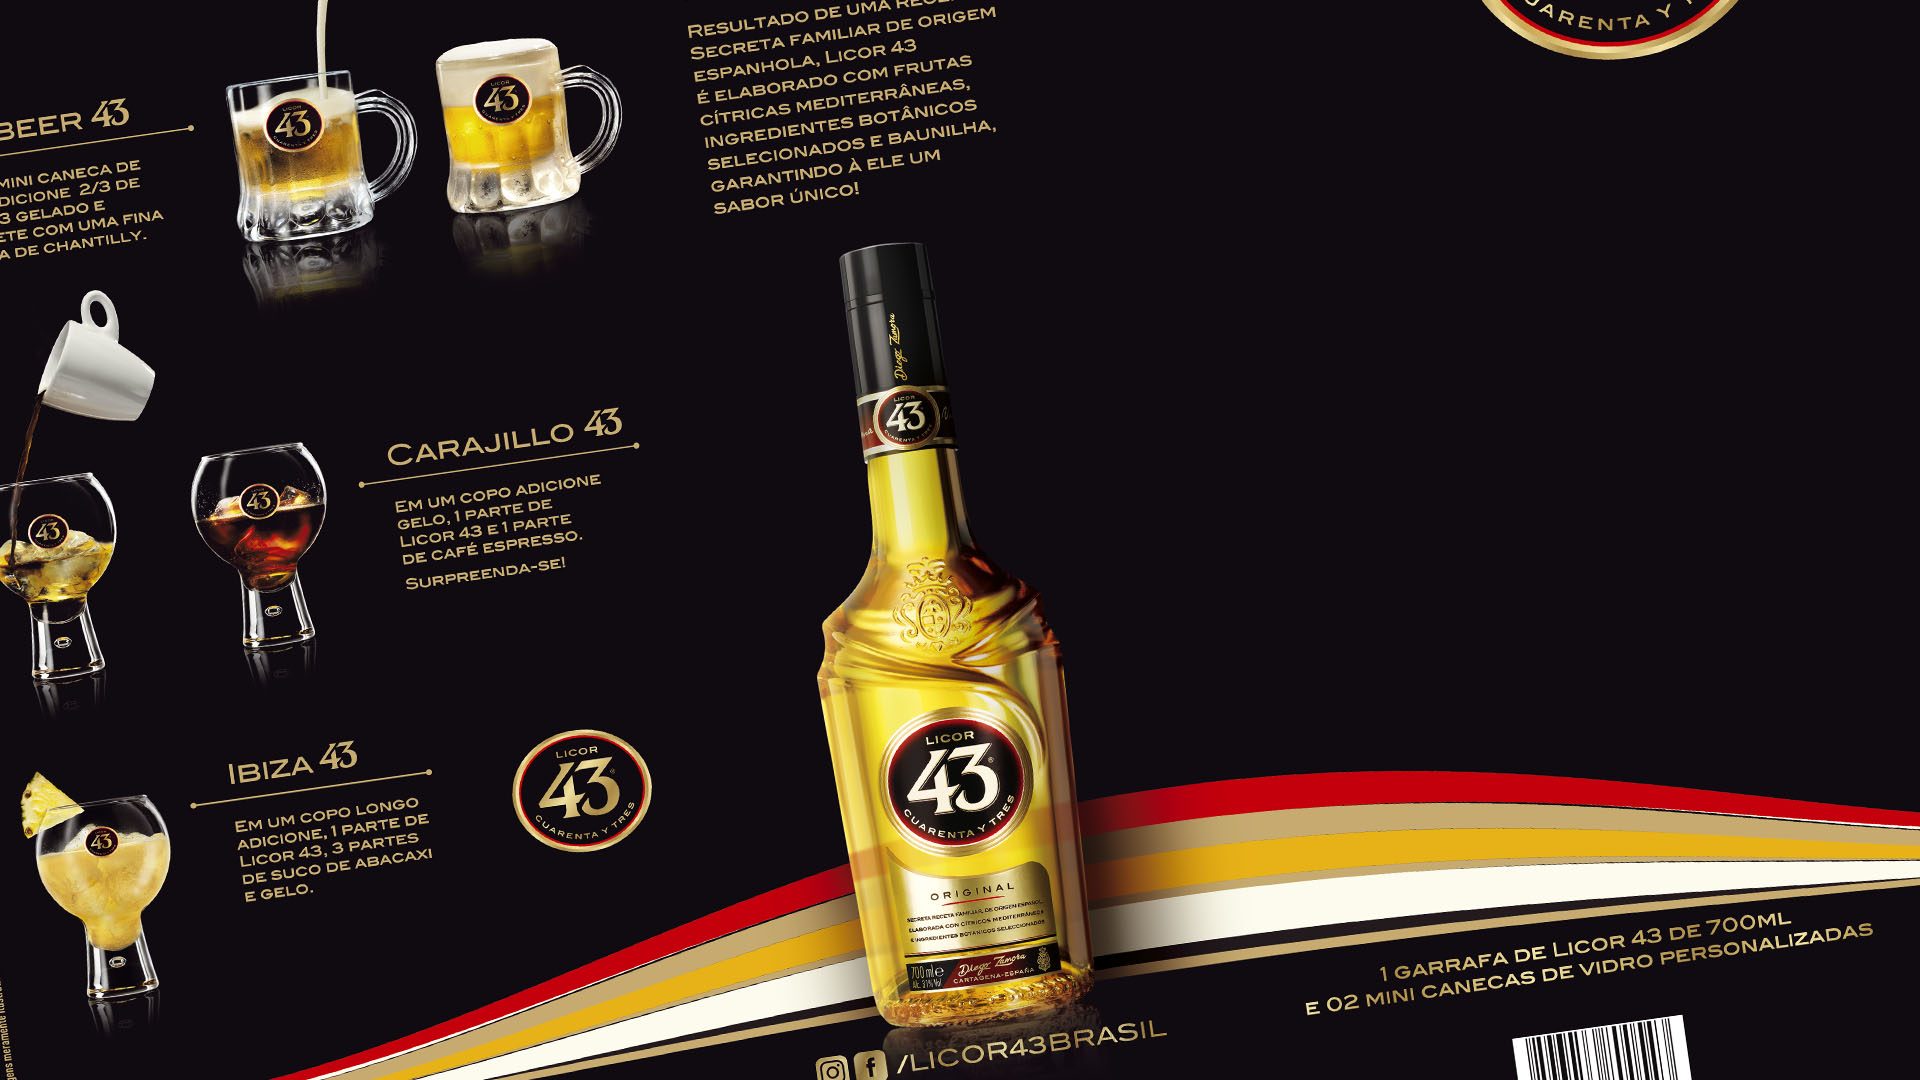 PromoPack Licor 43